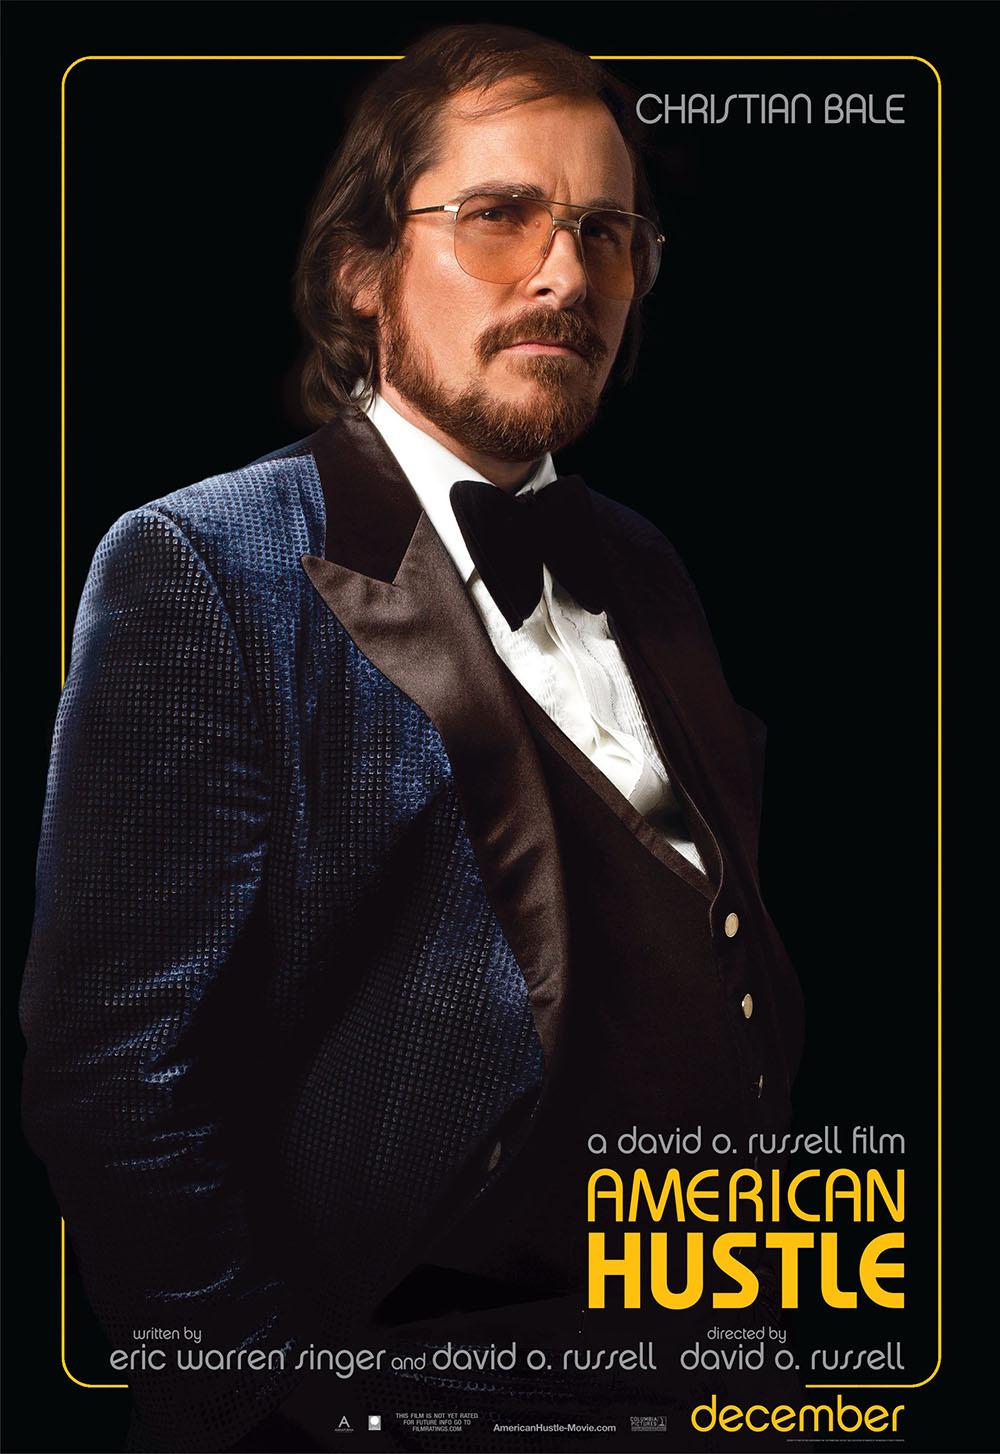 Christian Bale American Hustle movie poster